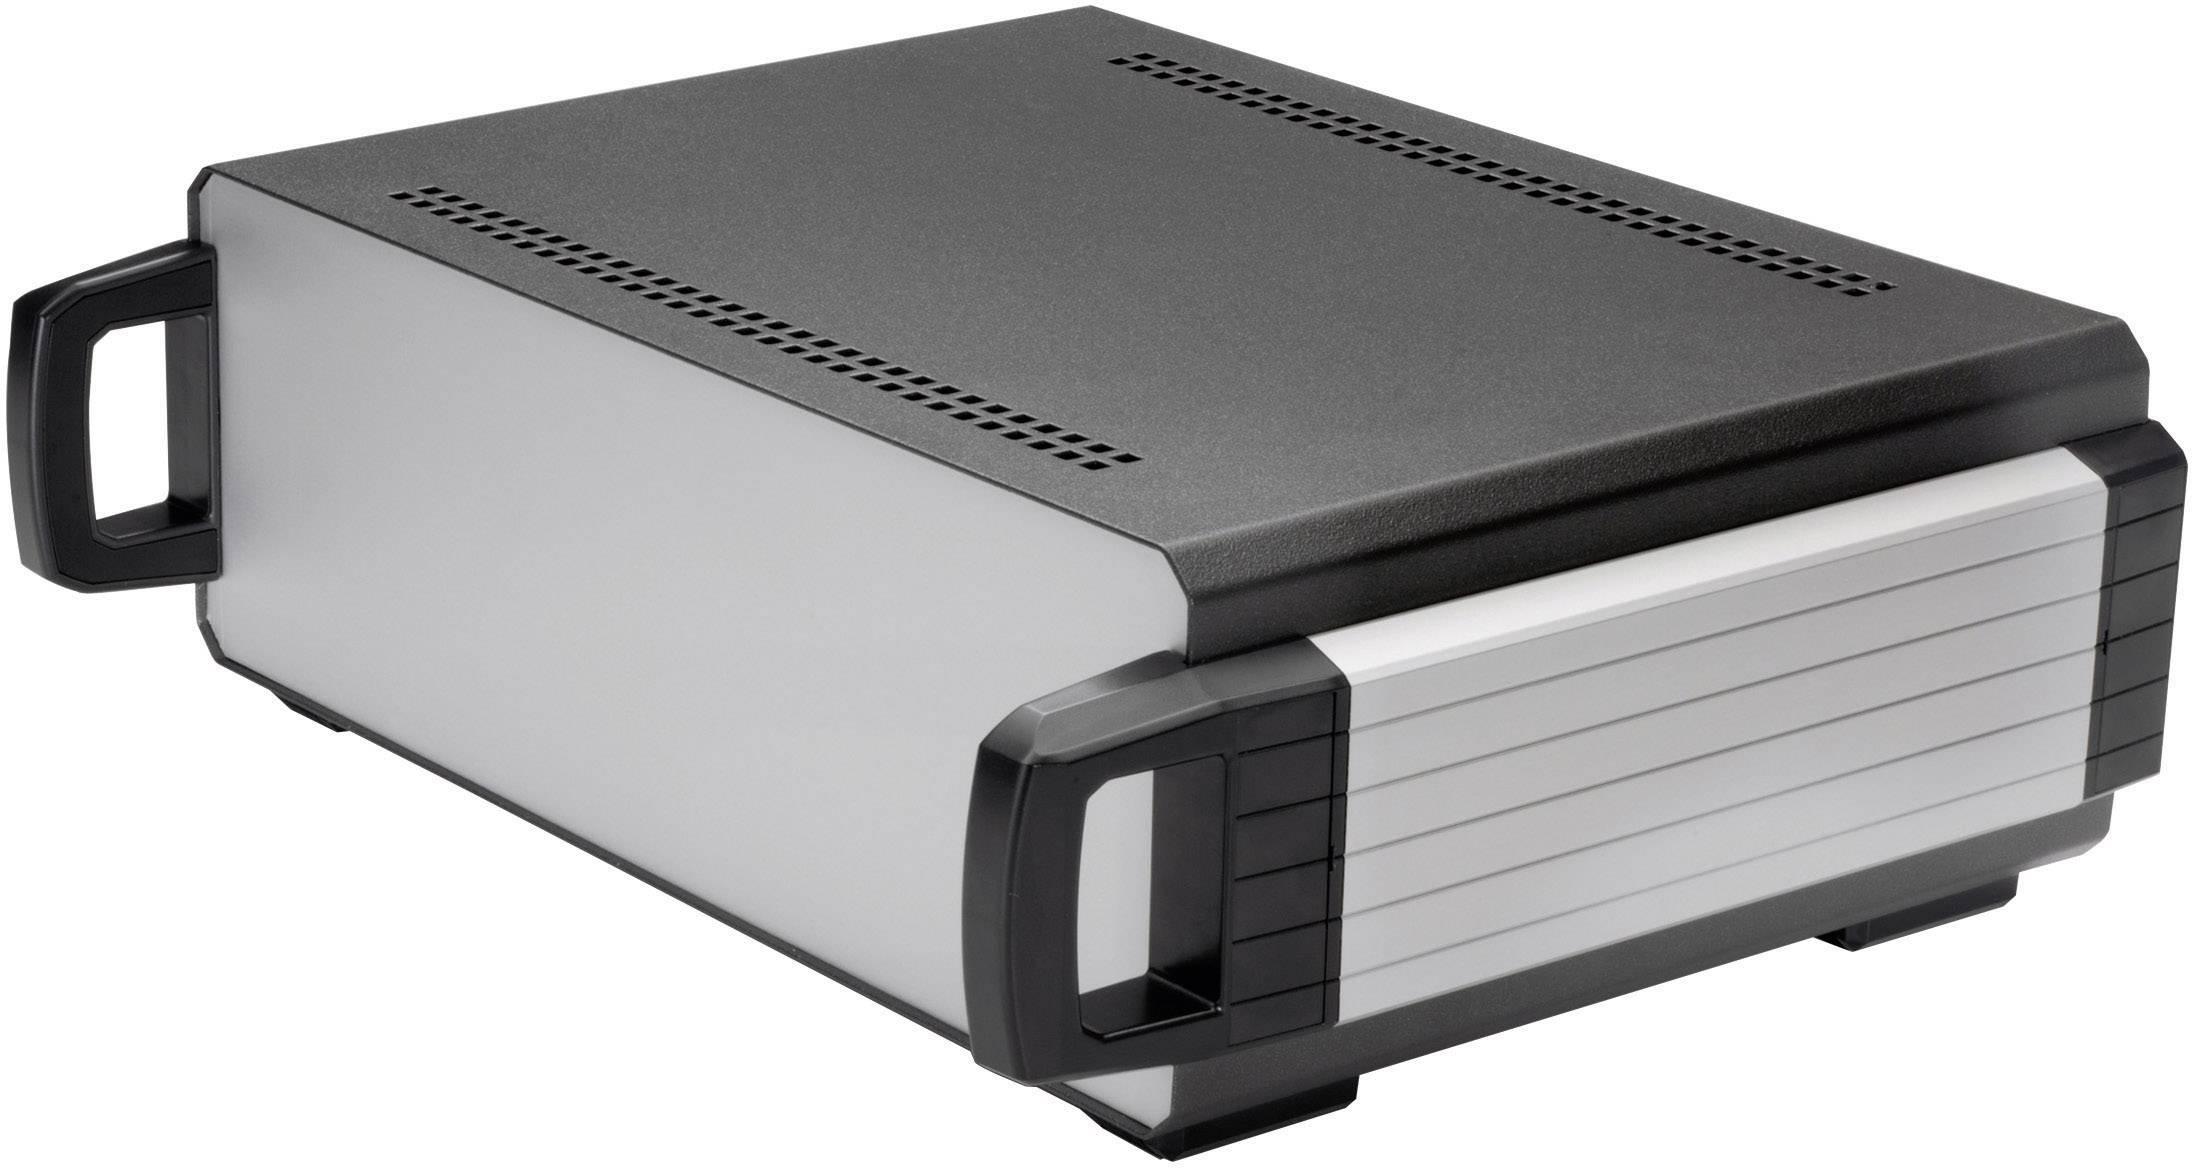 Stolní pouzdro hliníkové Axxatronic 31110007-CON, (d x š x v) 400 x 300 x 130 mm, antracitov